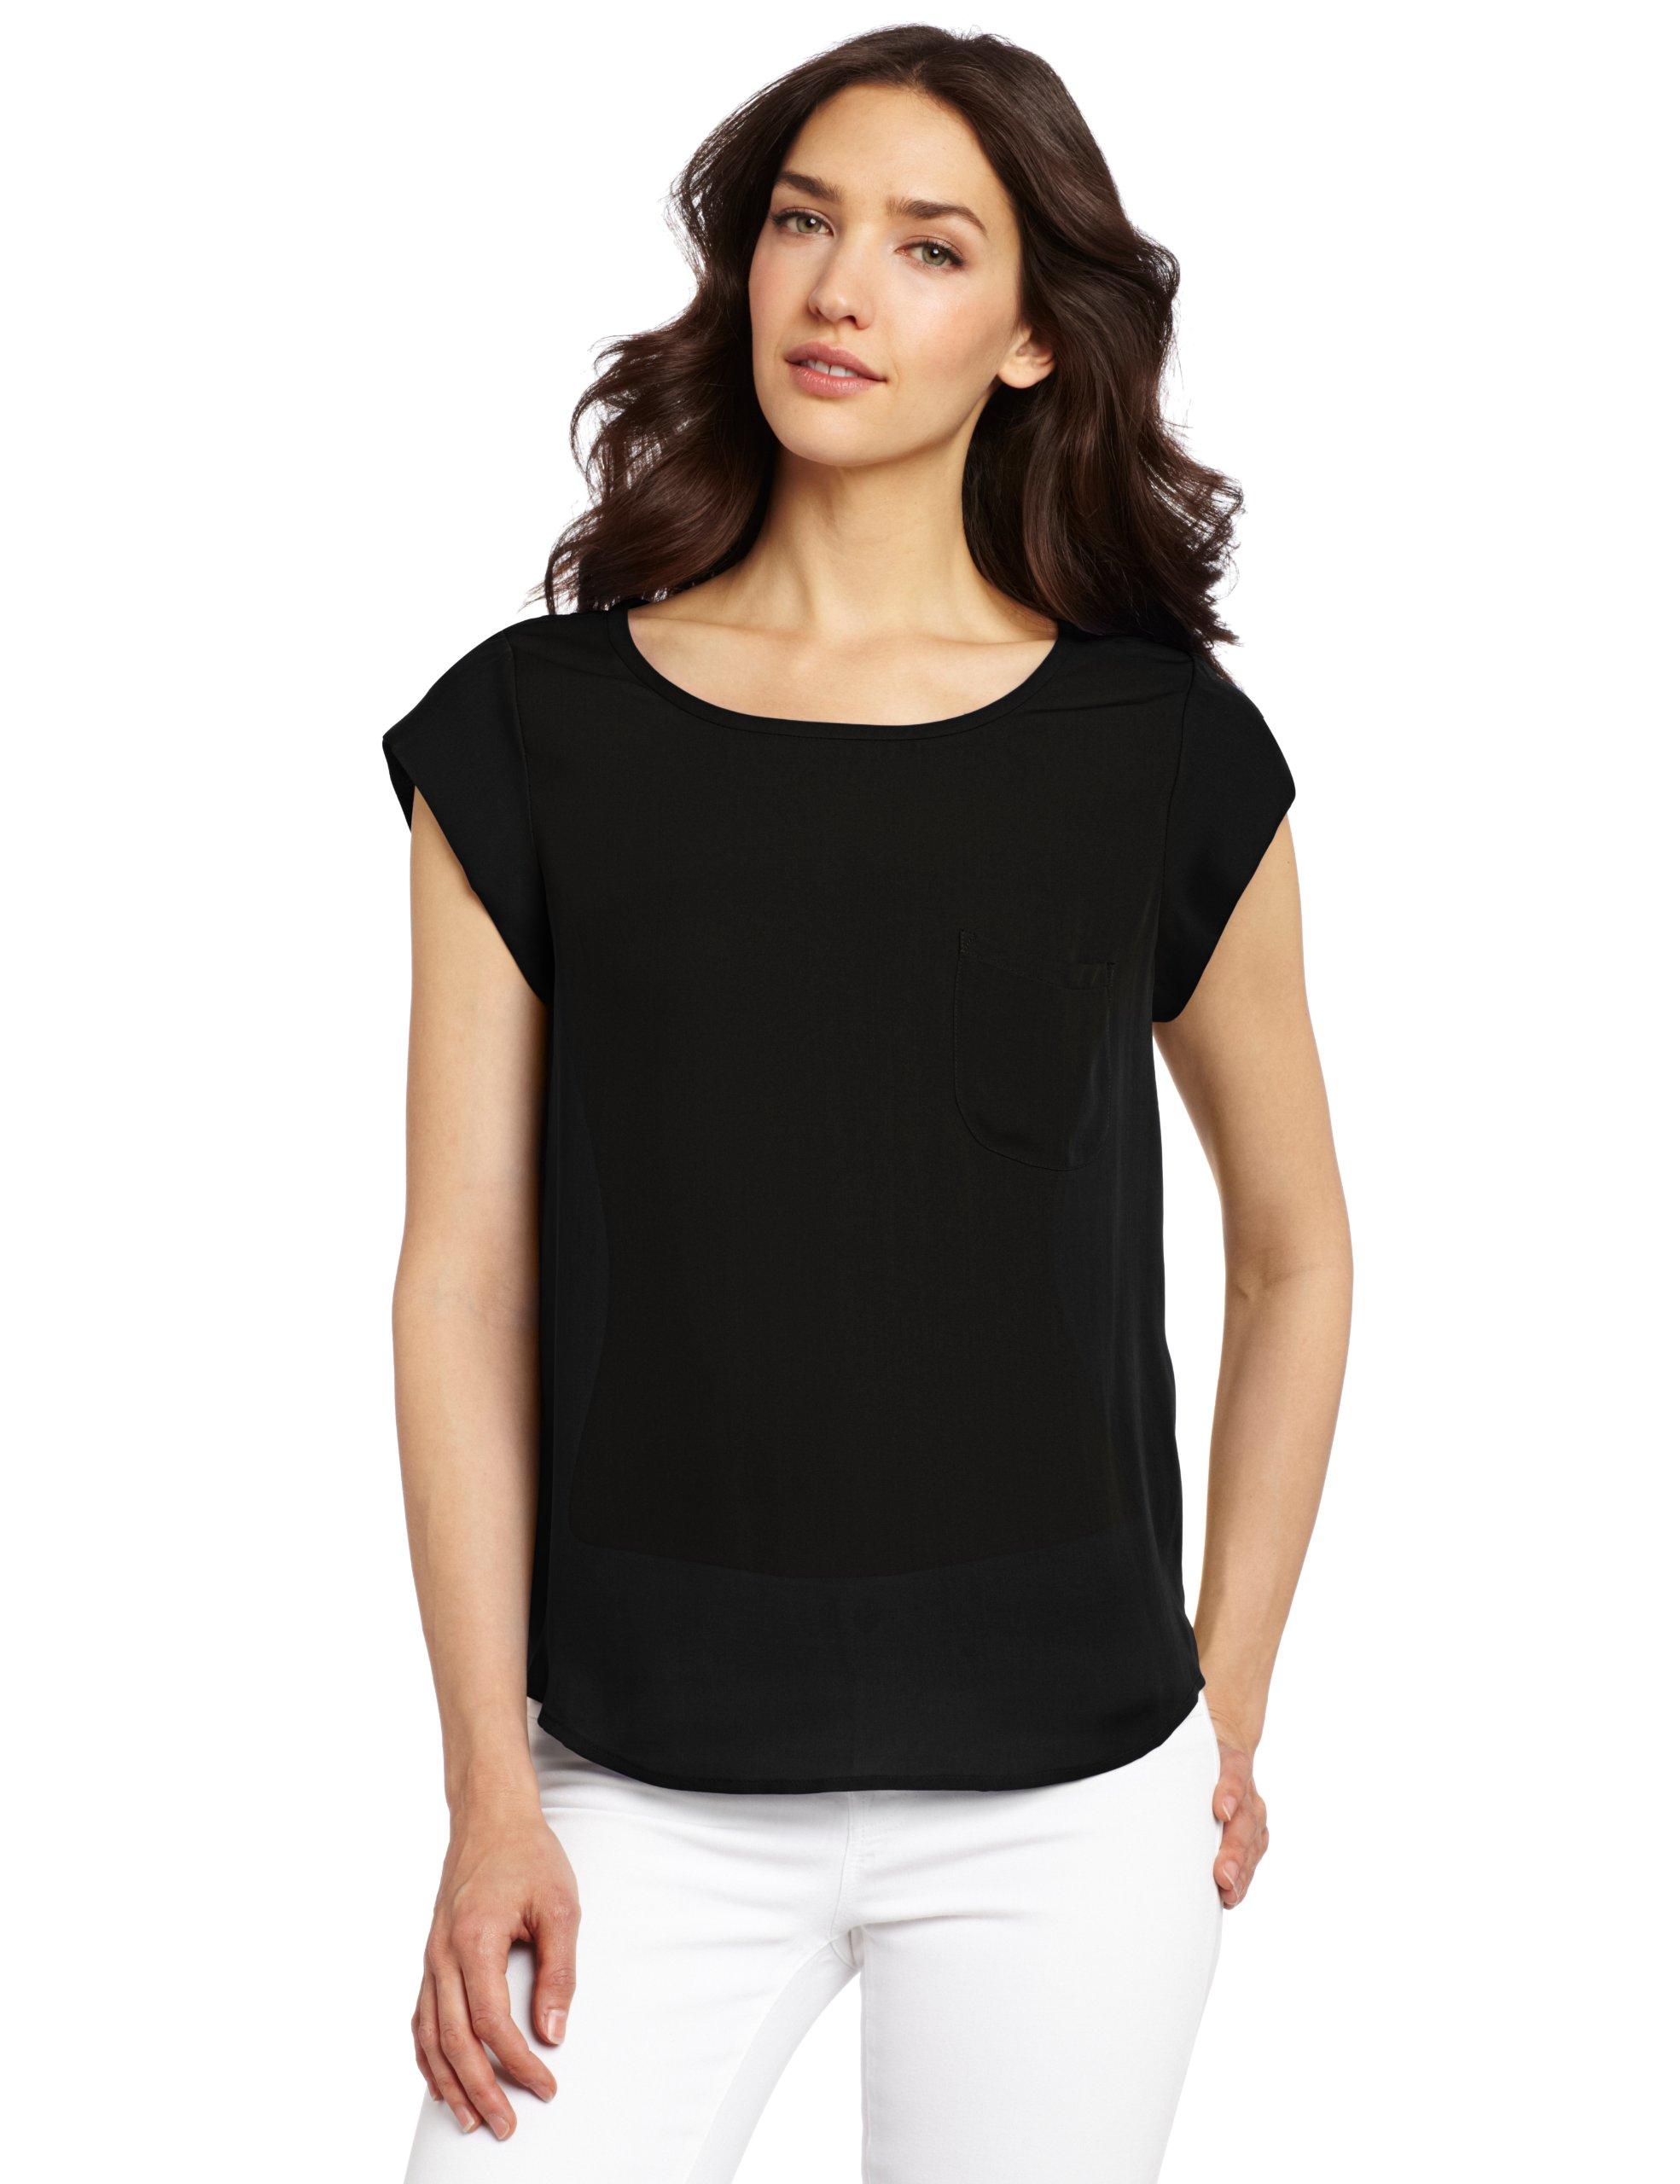 Joie Women's Rancher Silk Short Sleeve Pocket Top,Caviar,Large